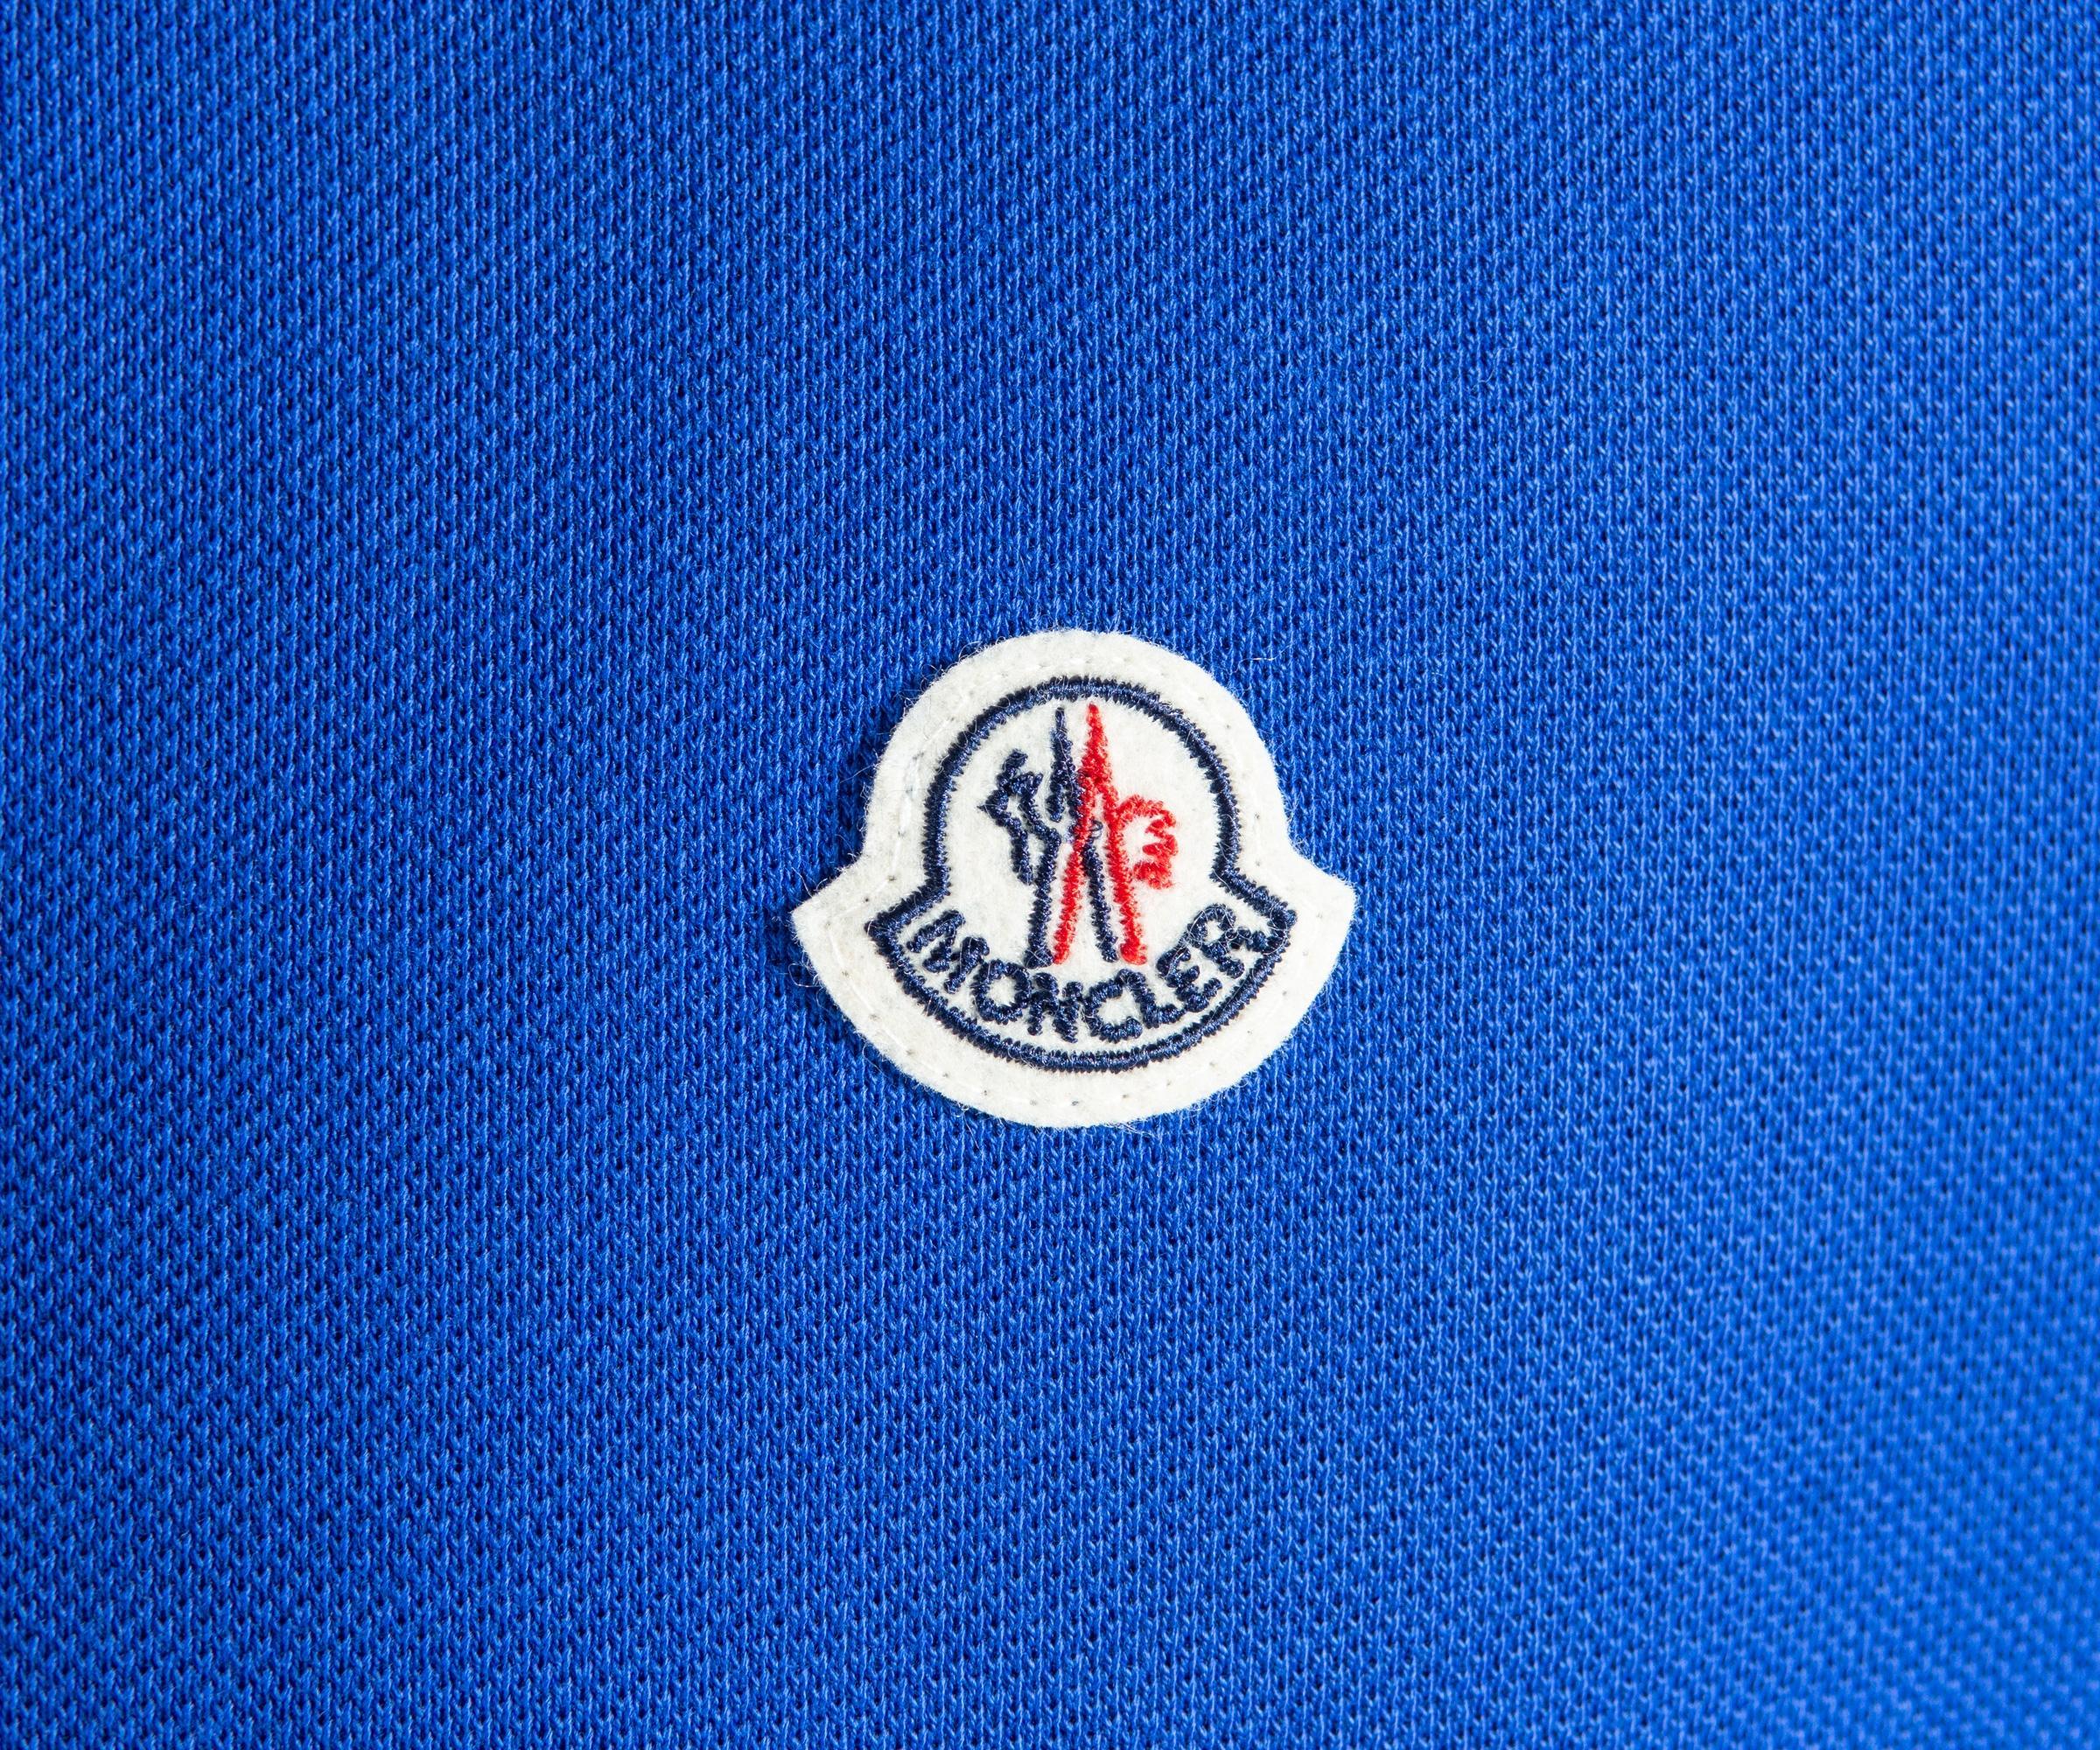 2ab0ac8b04292 Moncler - 3-button Polo Royal Blue for Men - Lyst. View fullscreen